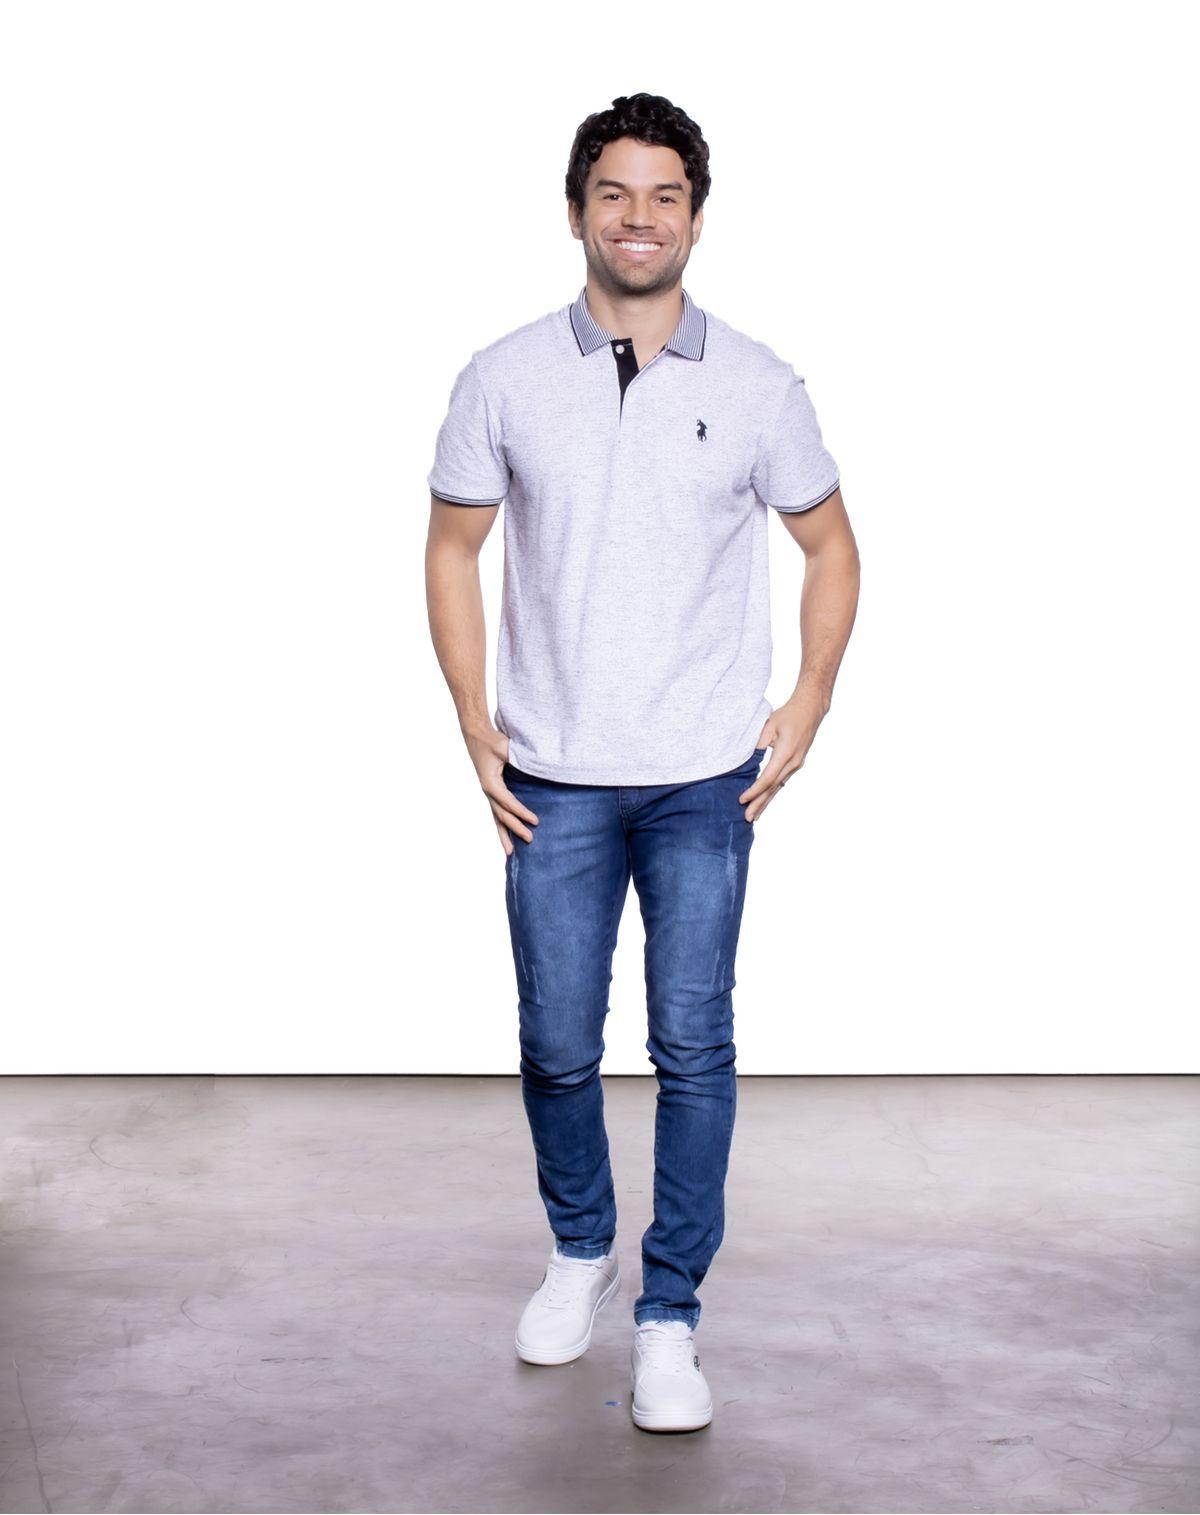 584192001-calca-jeans-slim-masculina-estonada-puidos-jeans-38-77b